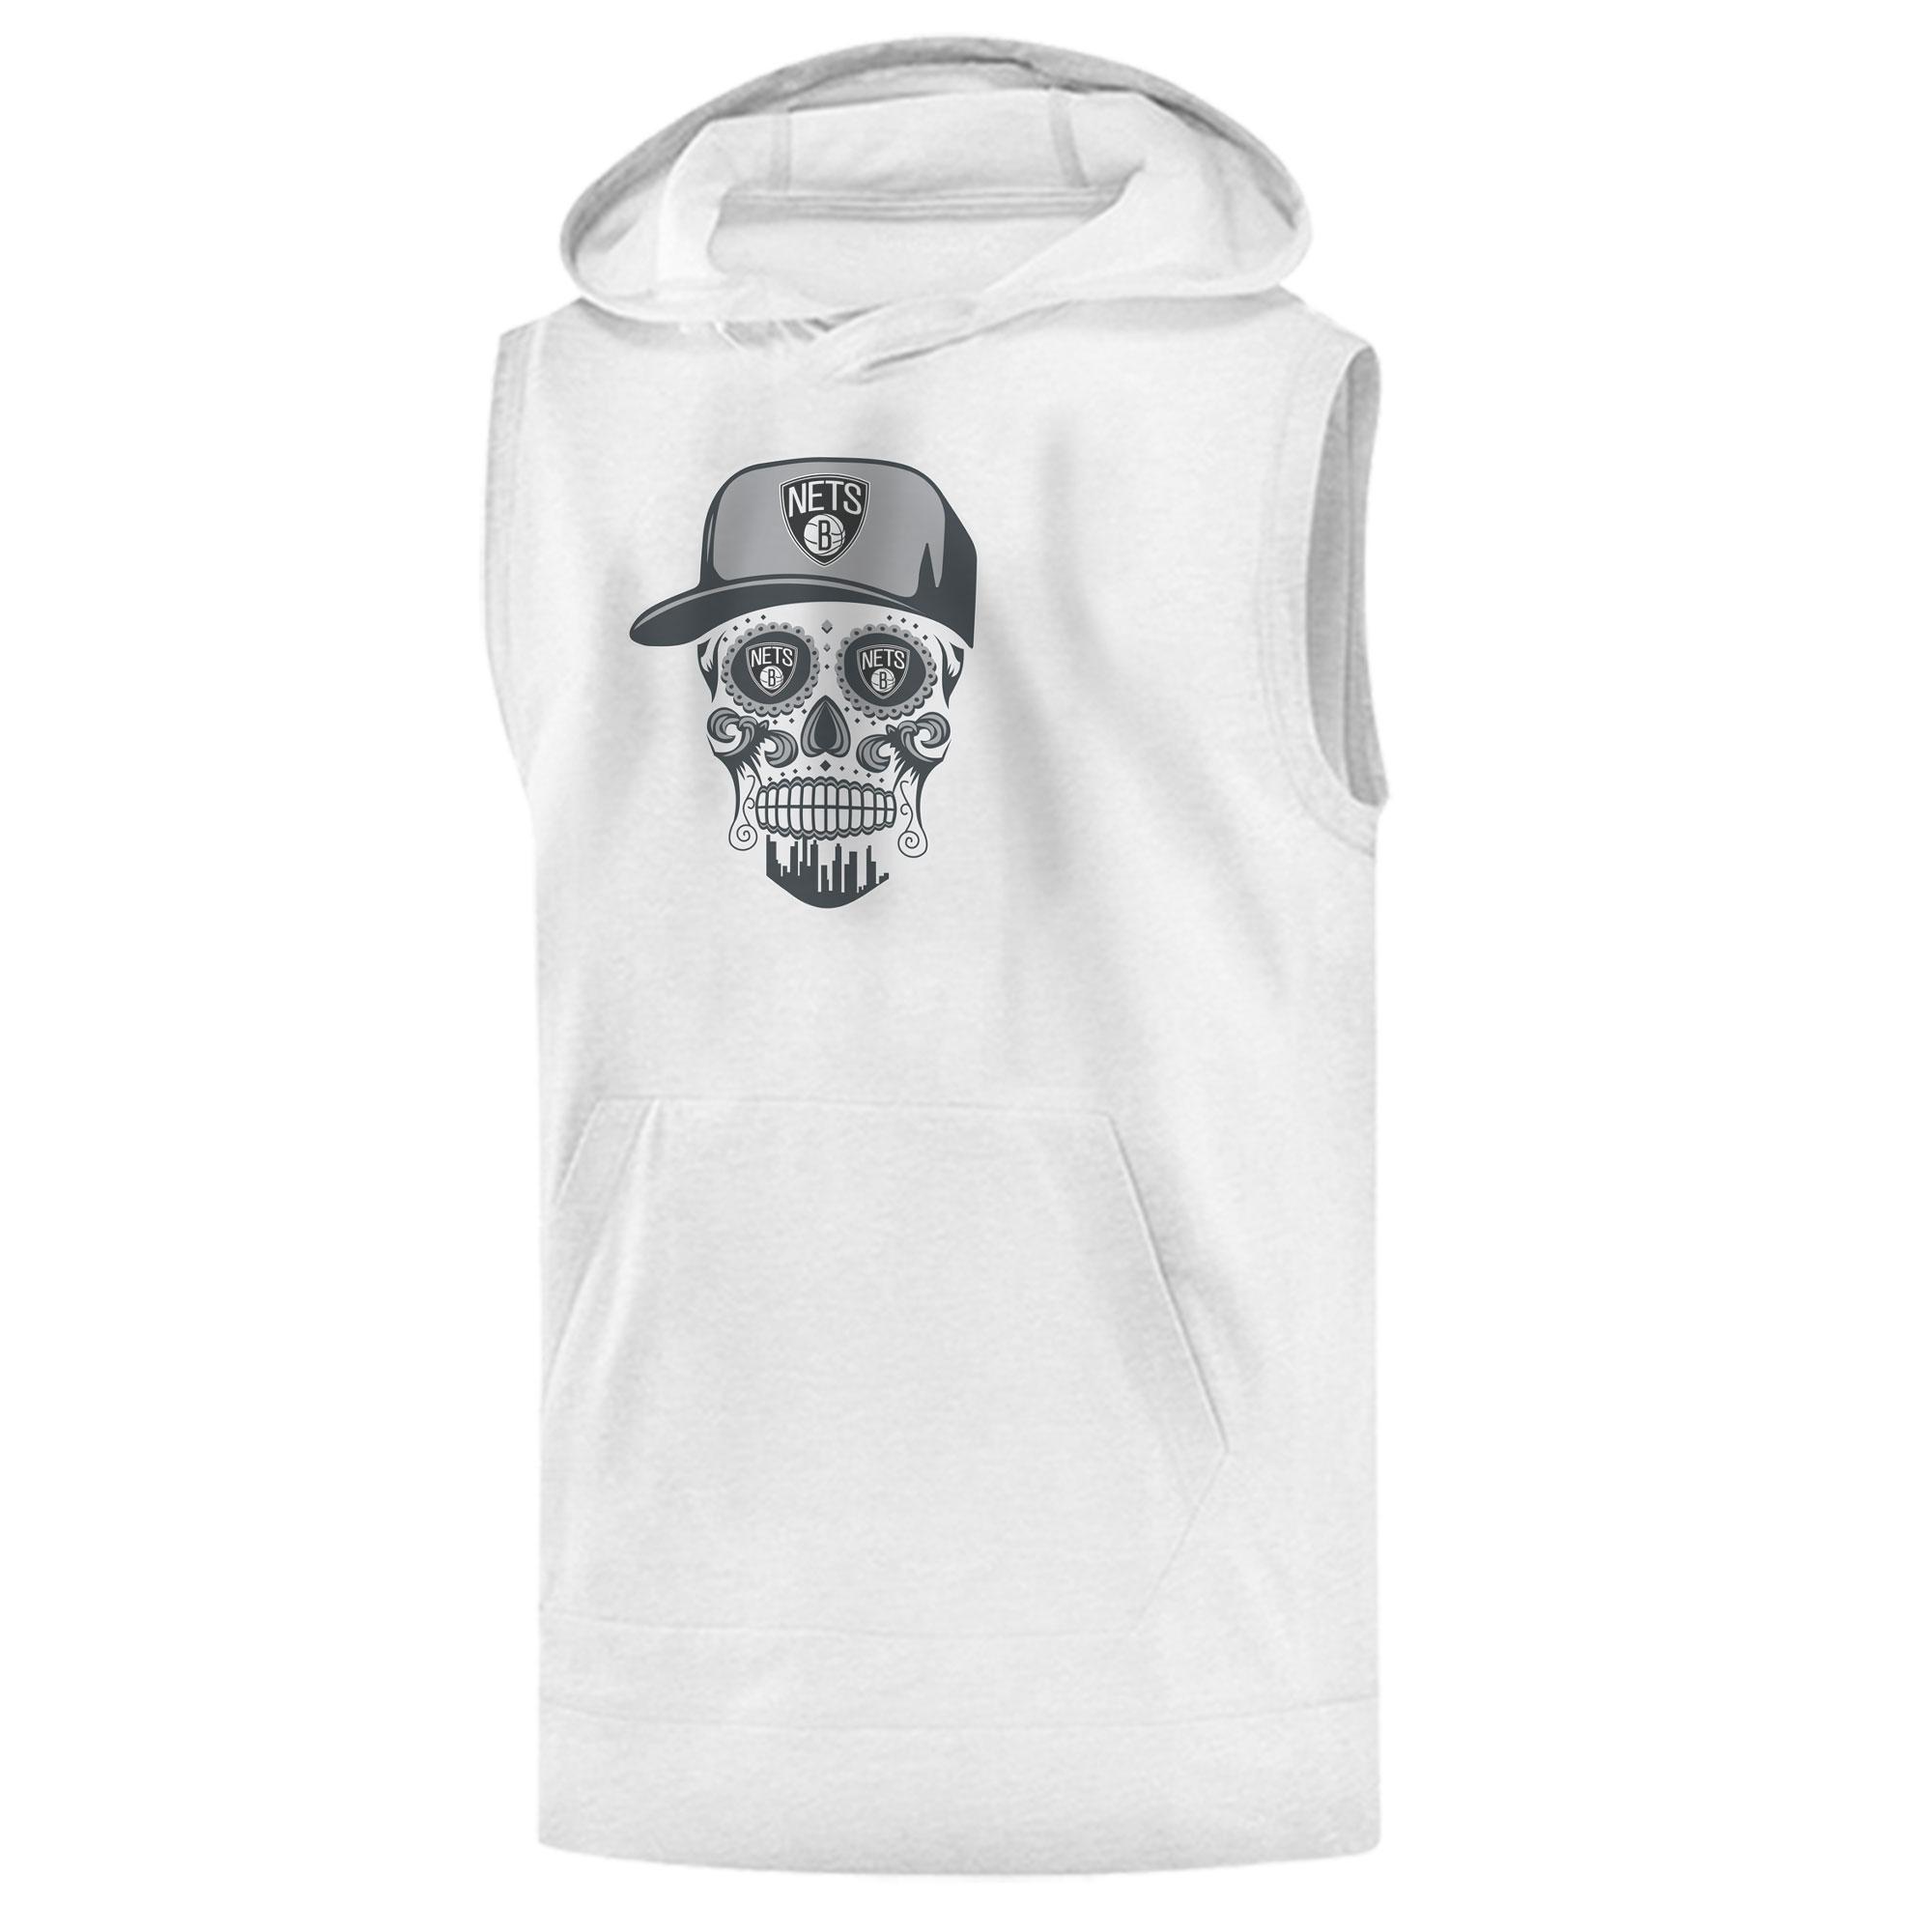 Brooklyn Skull Sleeveless (KLS-WHT-NP-445-NBA-BRO-SKULL)